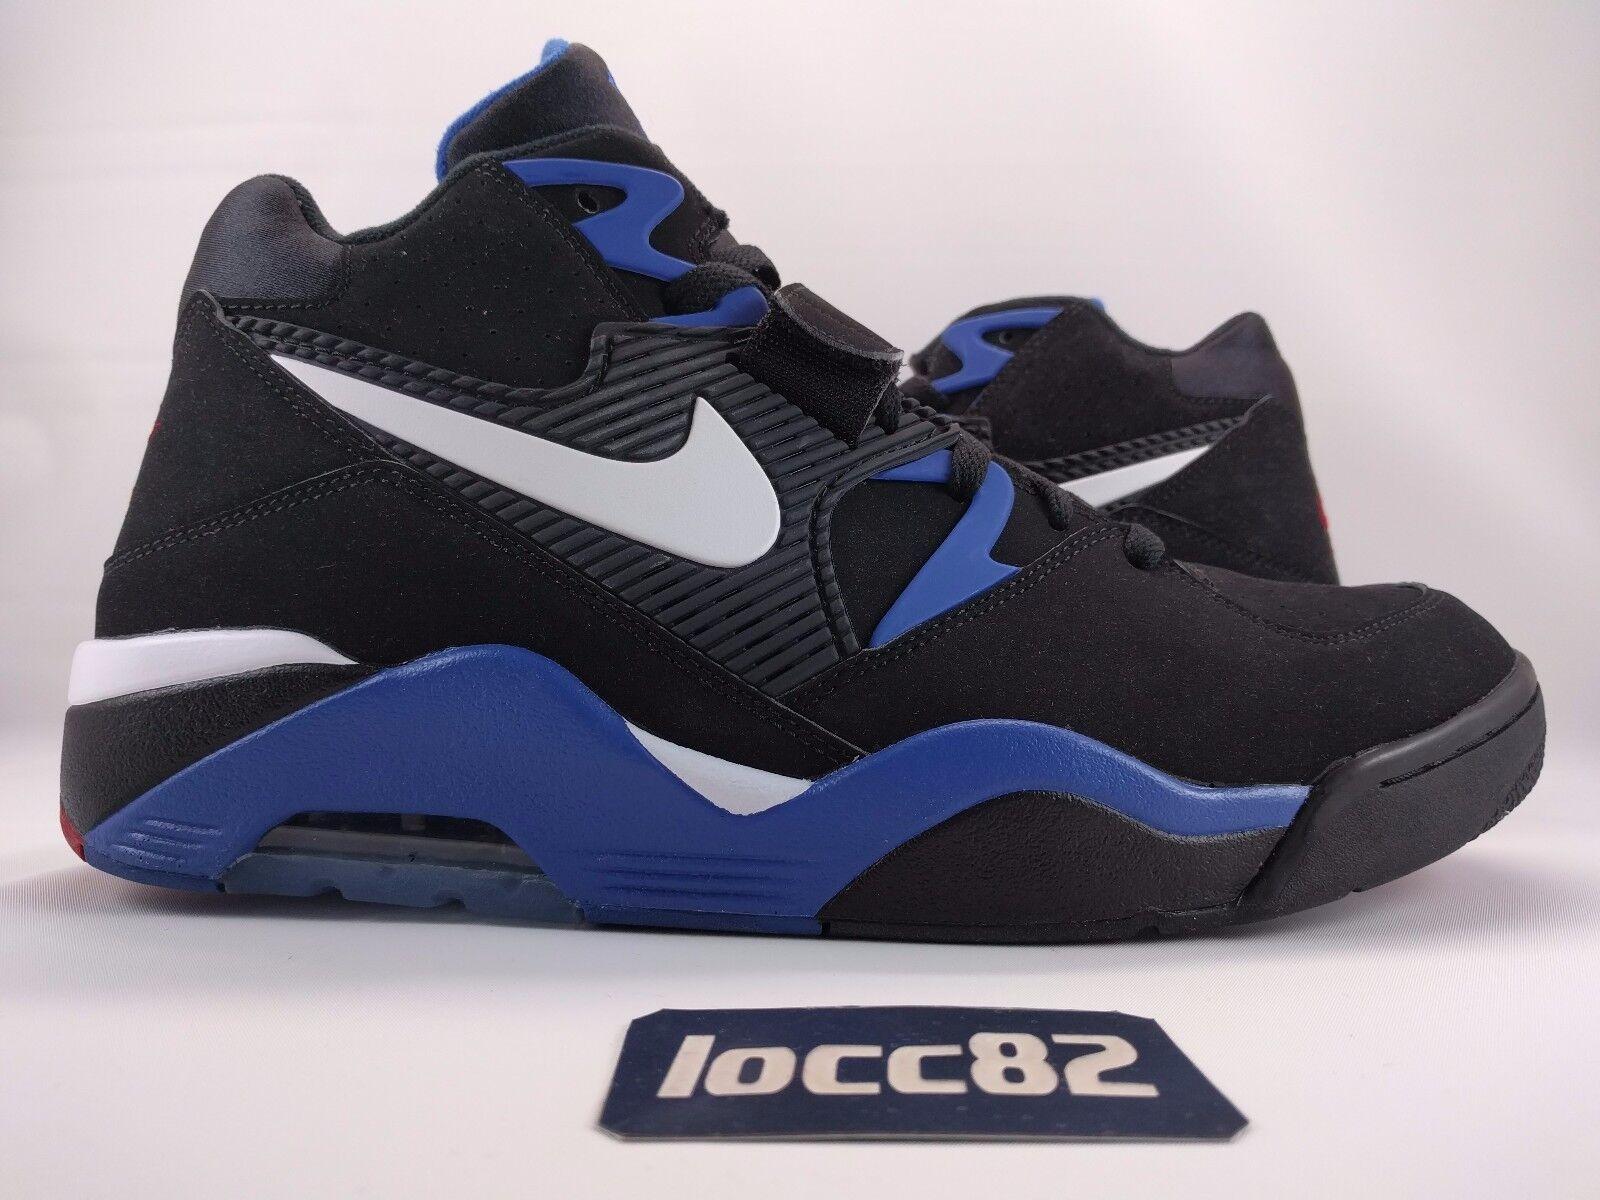 Nike air force 180 uomini retrò bc barkley nero bianco e blu (310095-011 sz)